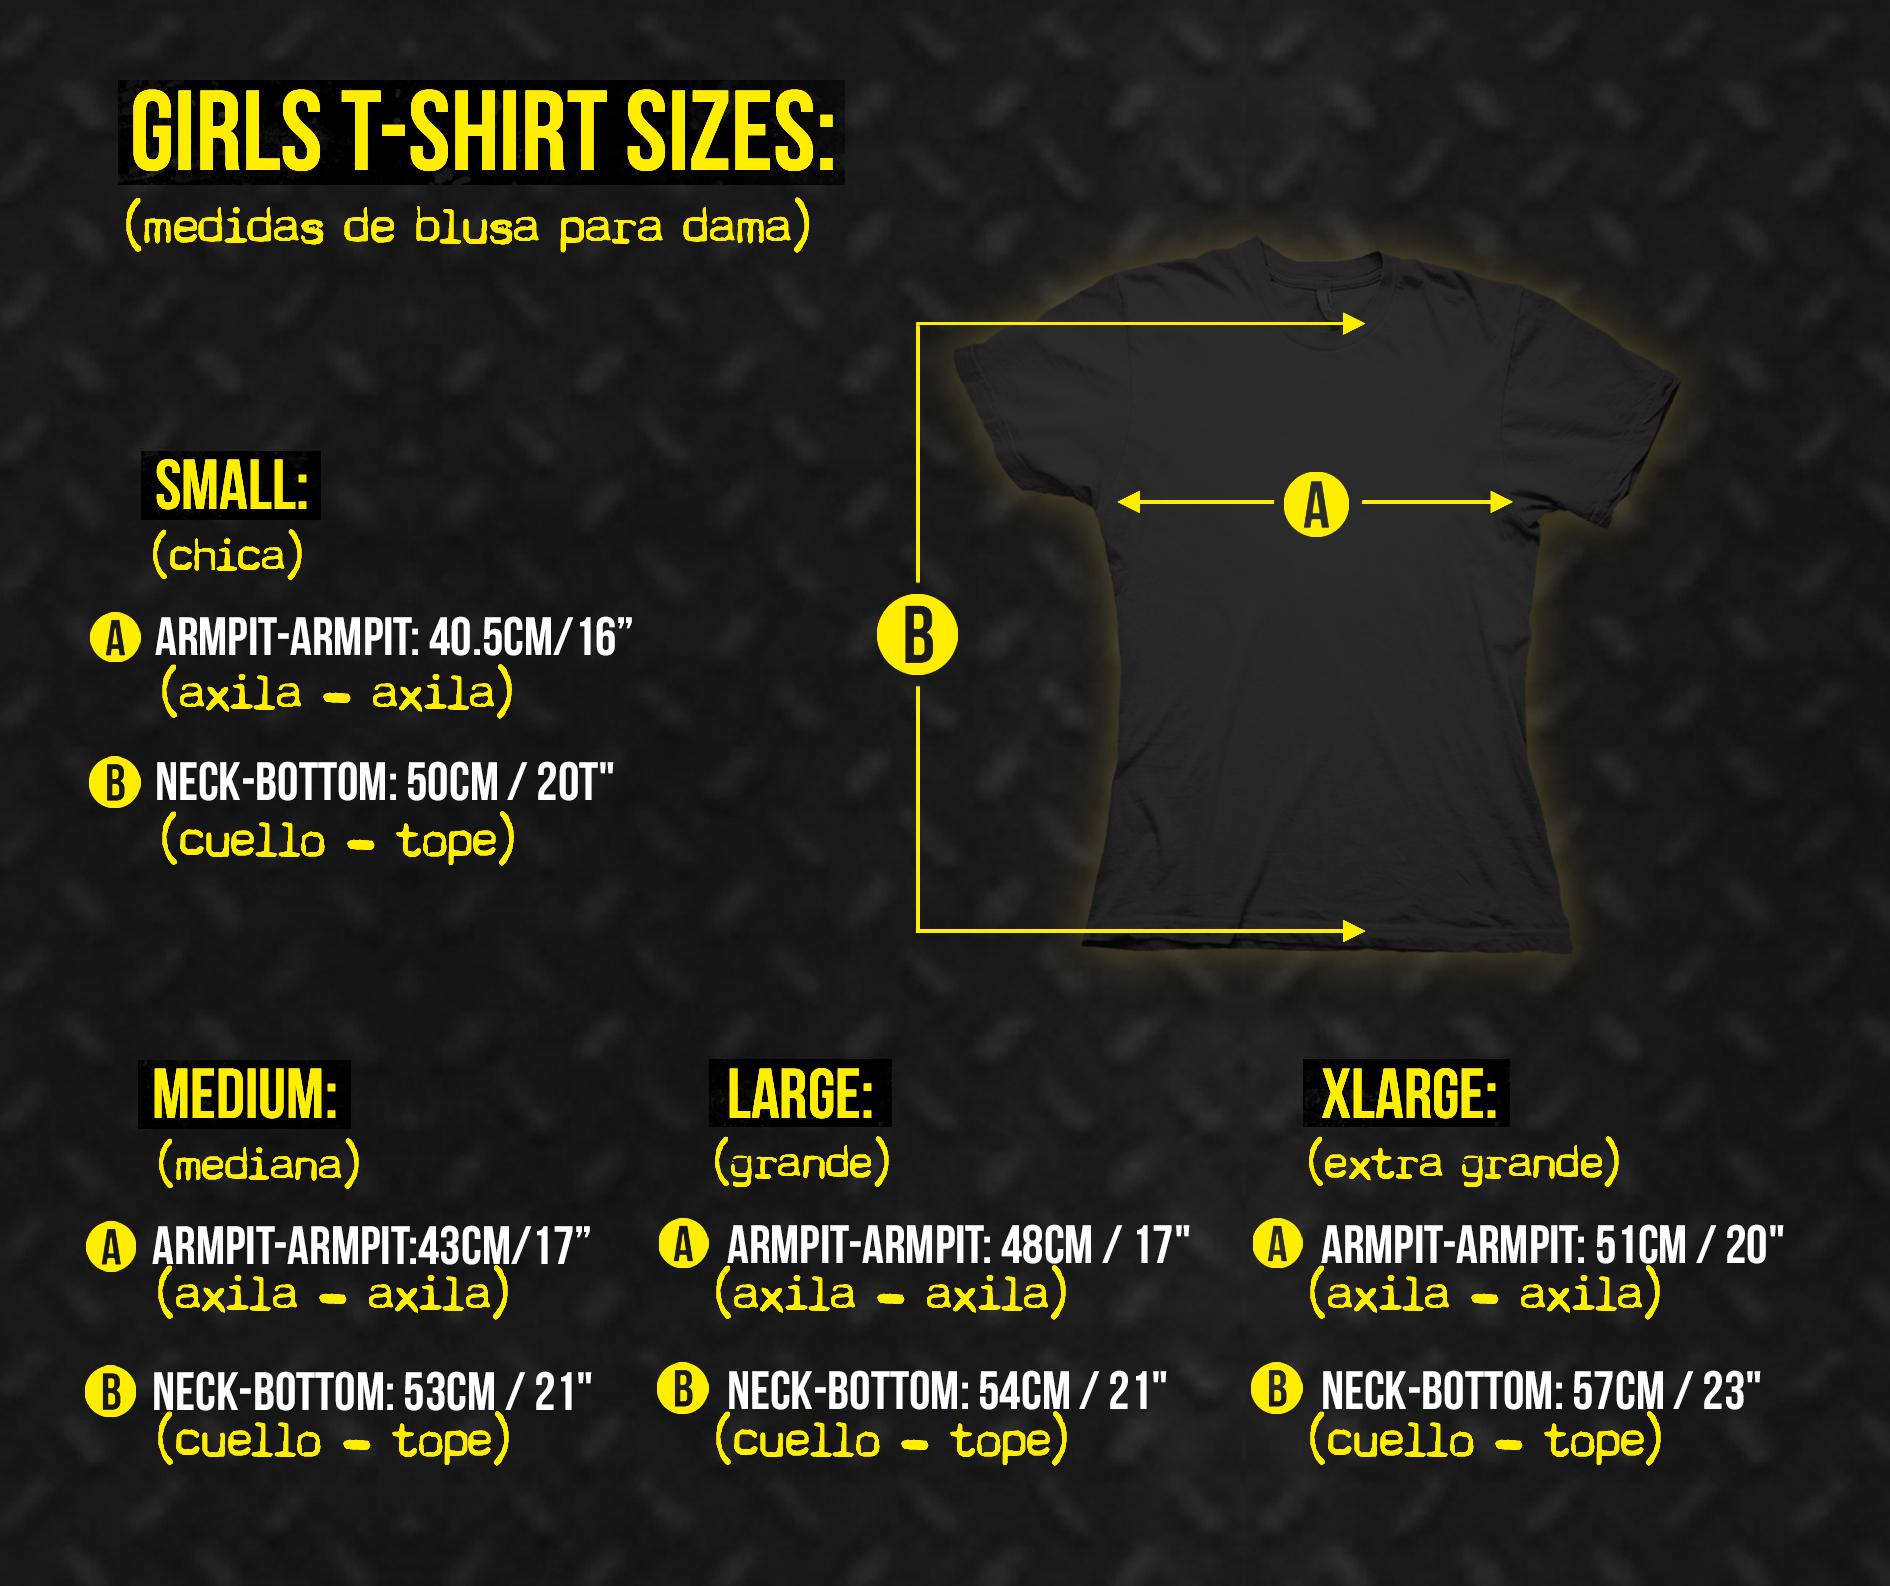 girls-shirt-sizes-actualized666.jpg